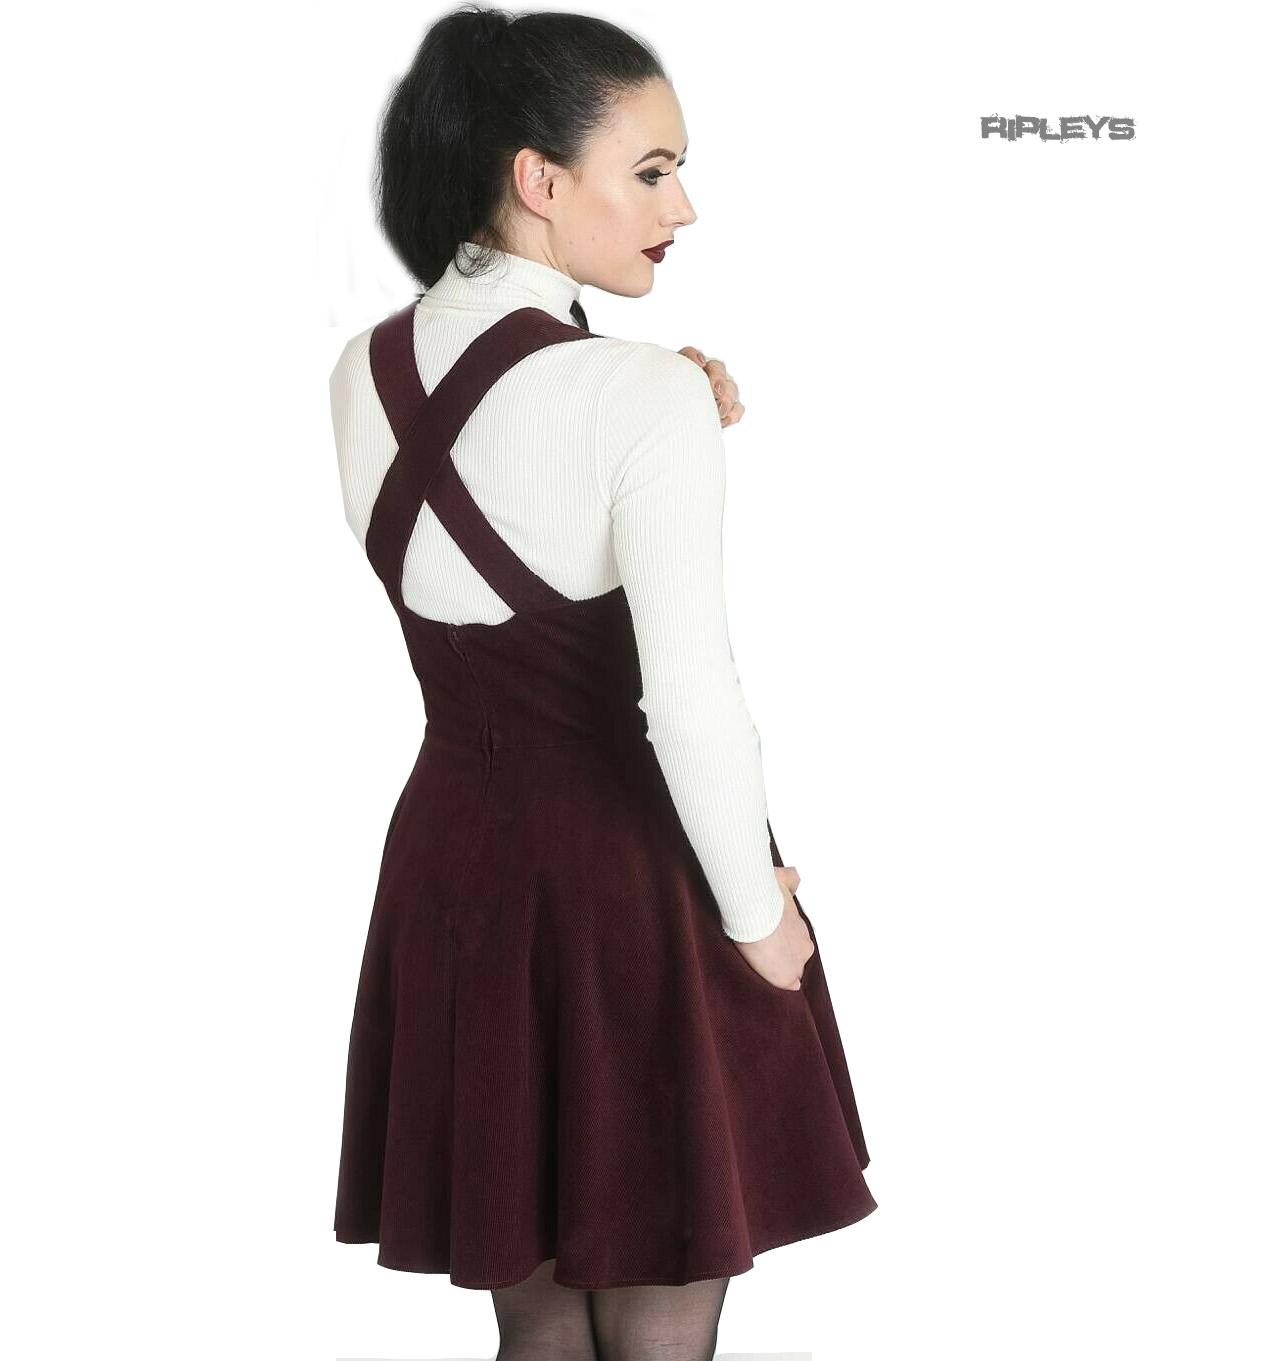 Hell-Bunny-Rockabilly-Corduroy-Mini-Dress-WONDER-YEARS-Pinafore-Wine-All-Sizes thumbnail 28